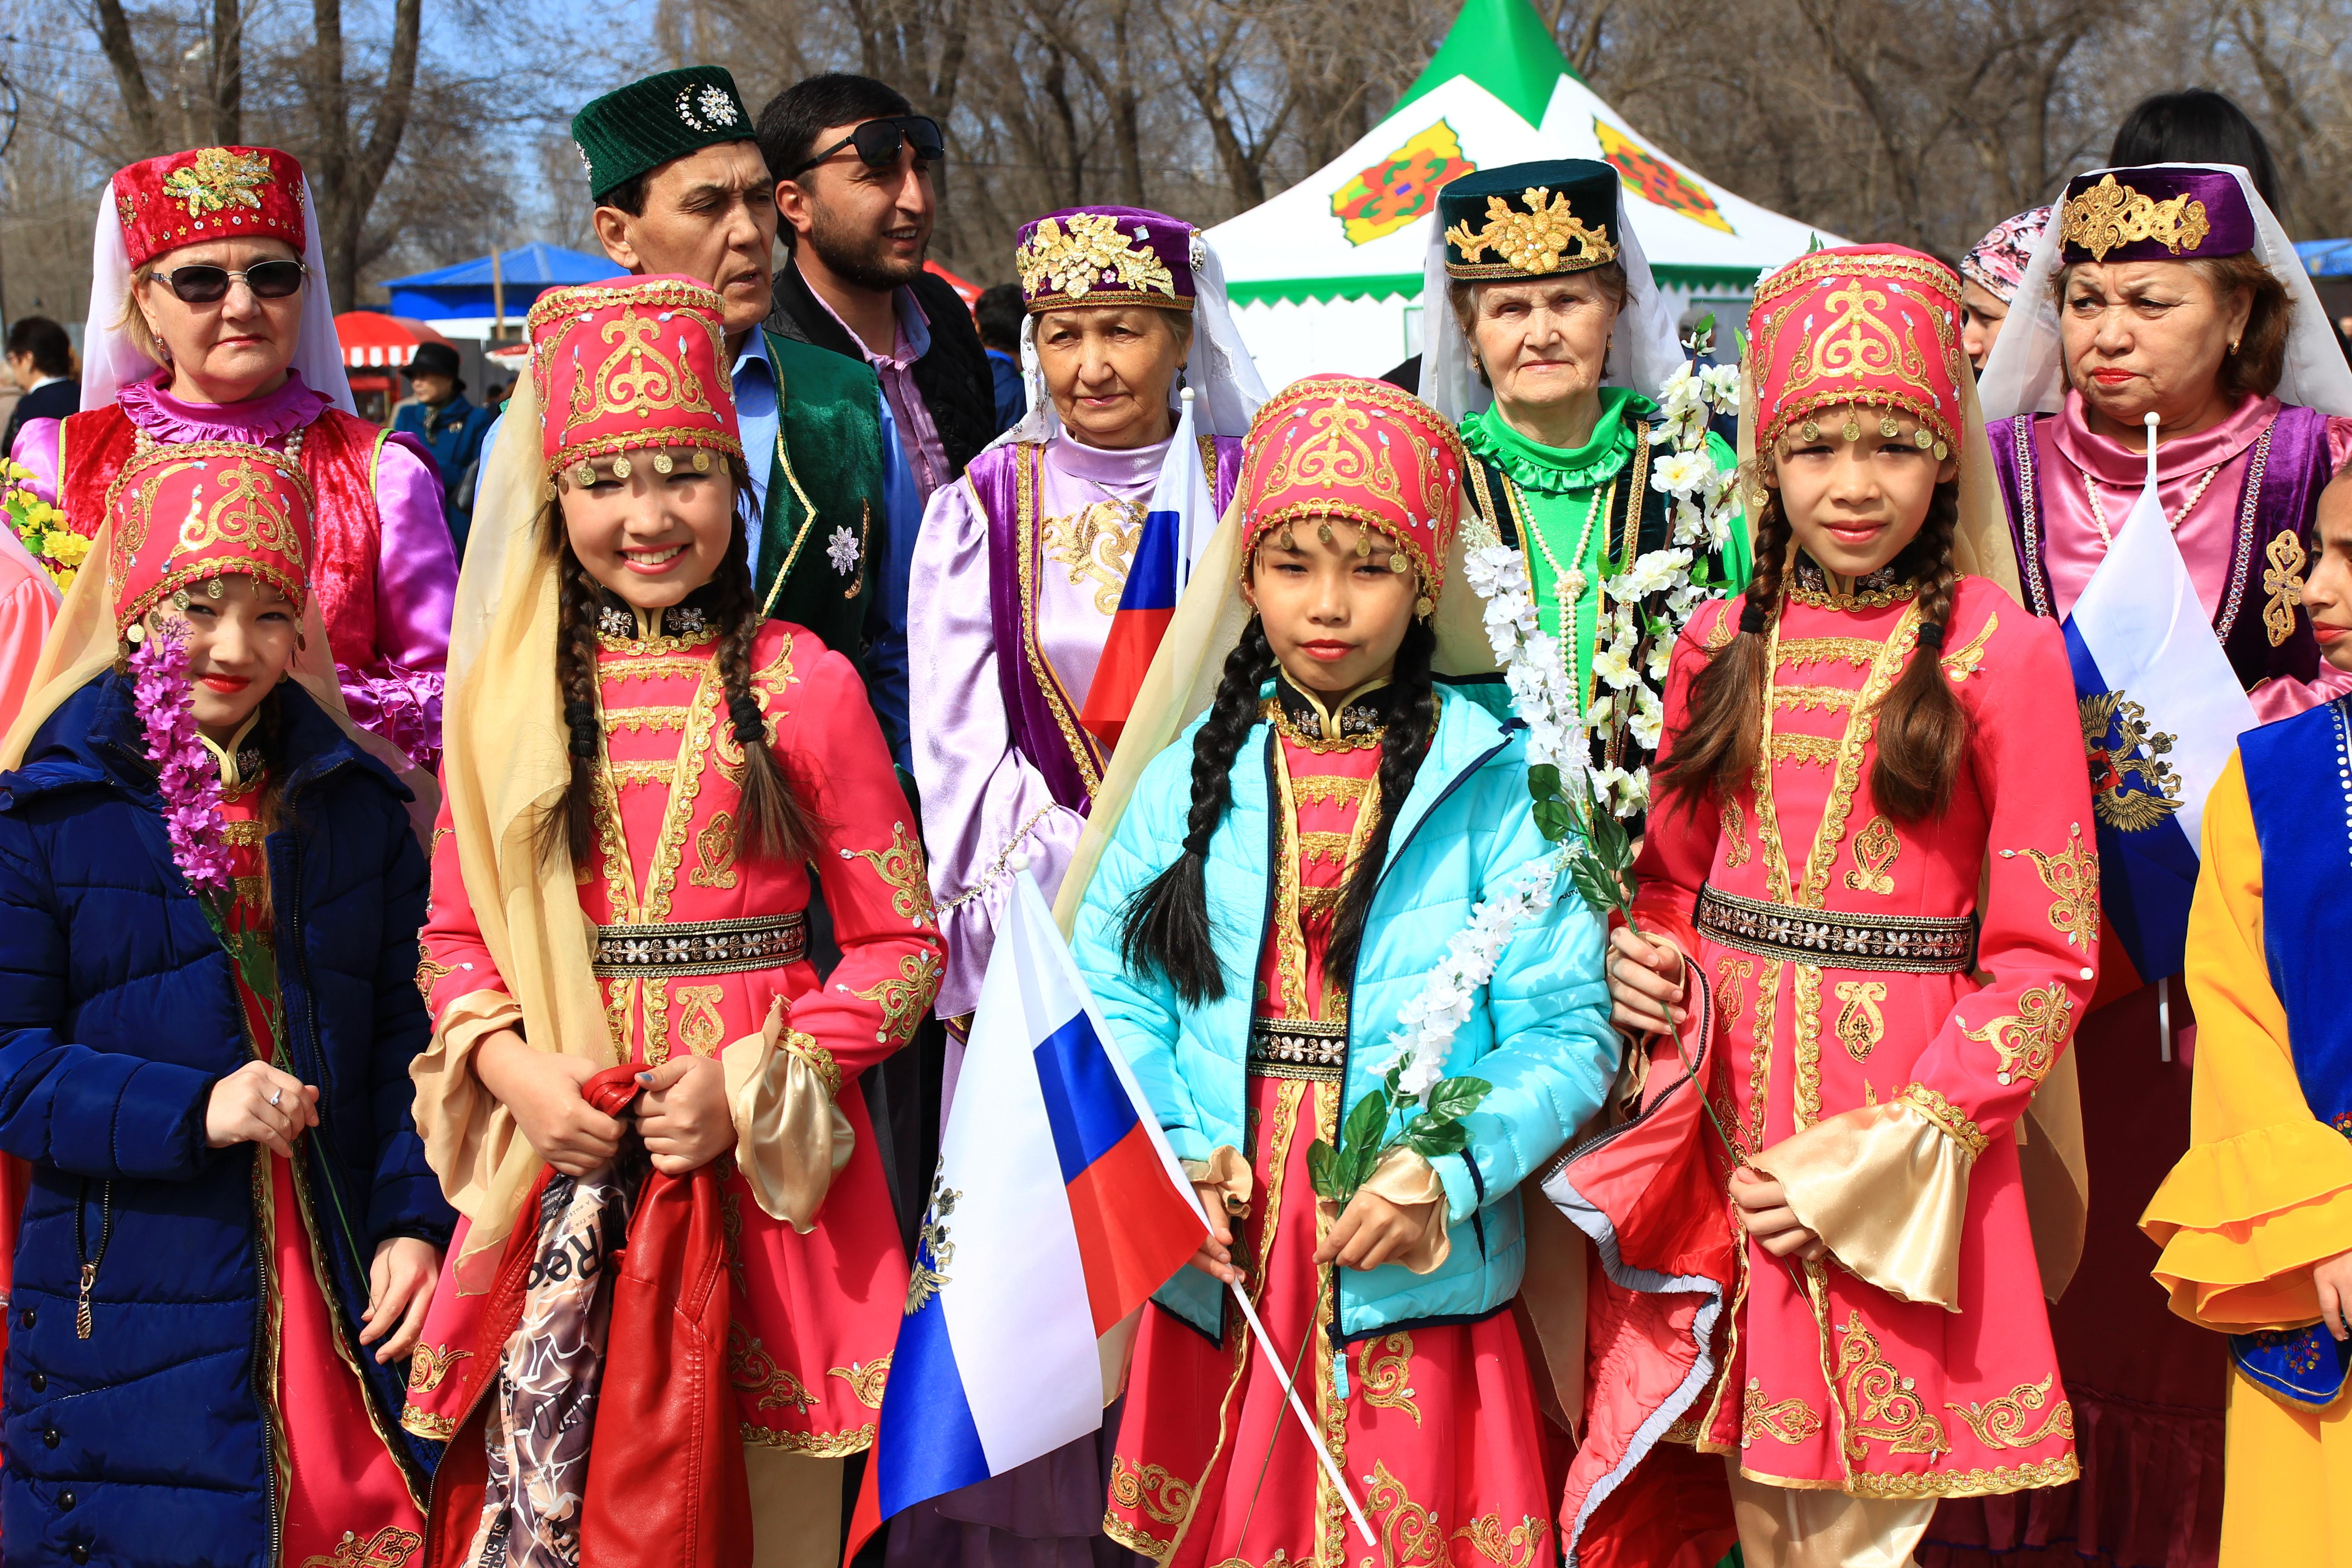 Праздник, объединяющий народы